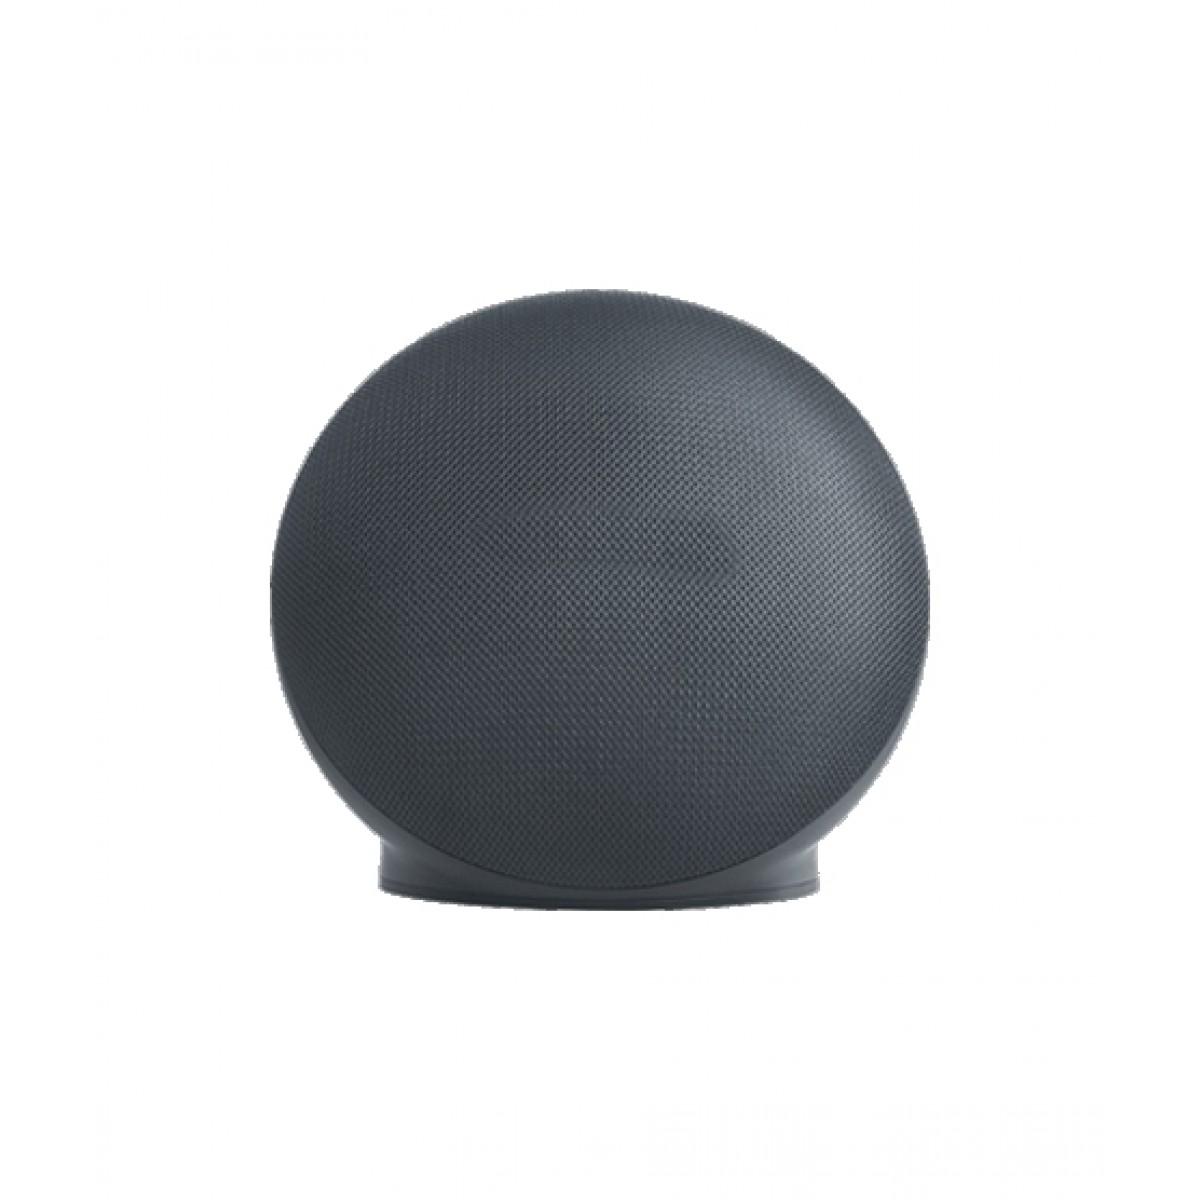 Cool Boy Mart Onyx Mini Portable Wireless Speaker